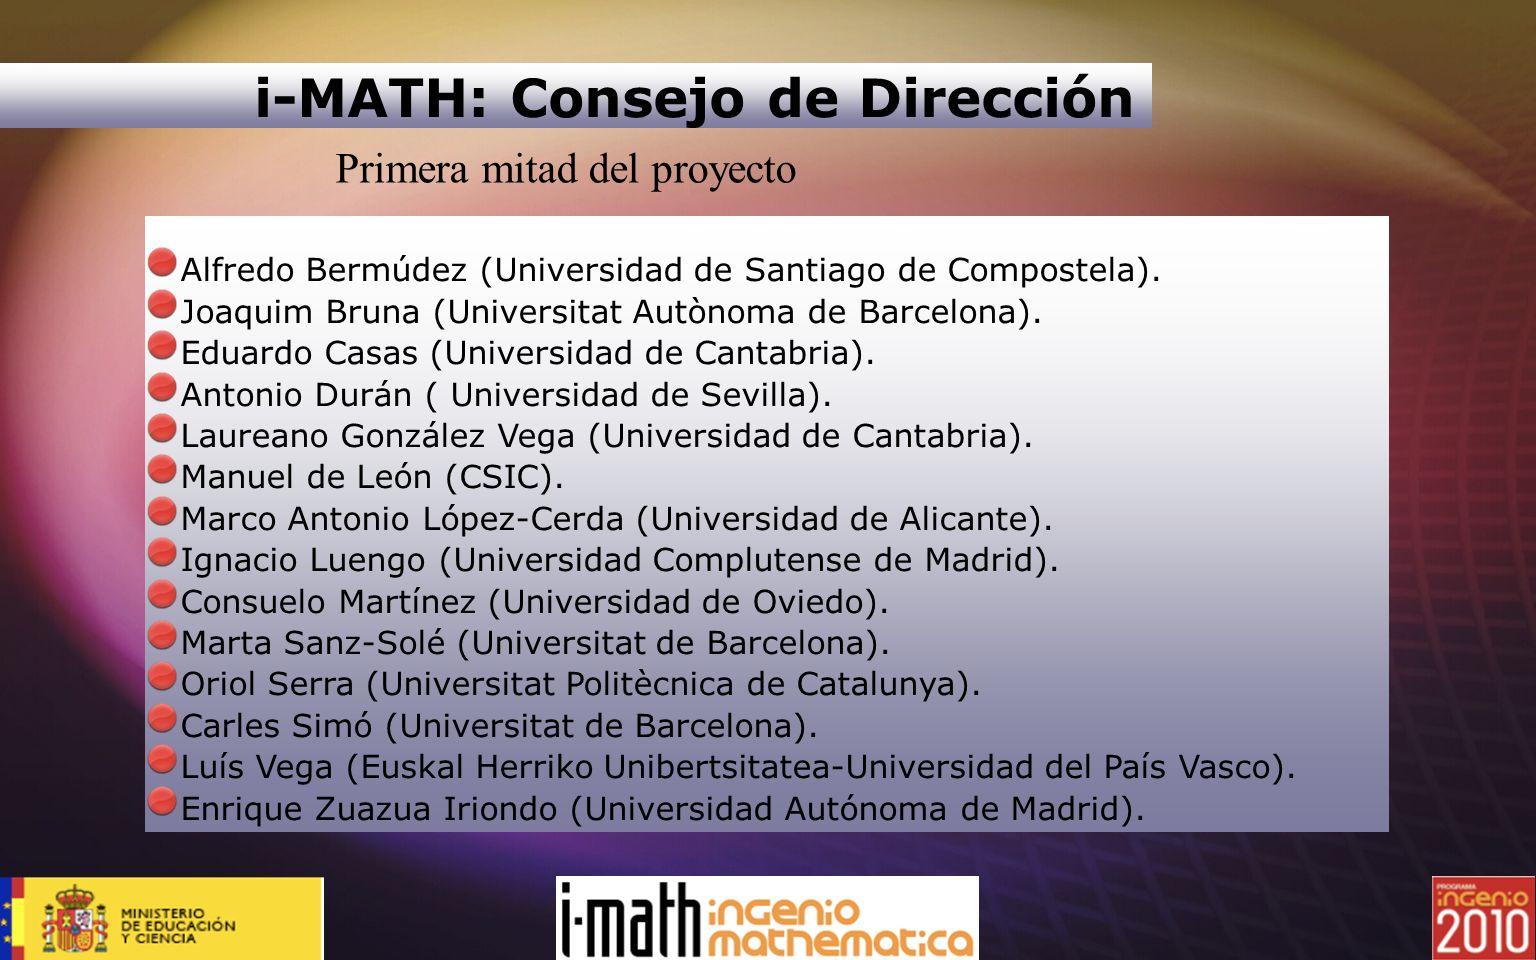 i-MATH: Consejo de Dirección Alfredo Bermúdez (Universidad de Santiago de Compostela). Joaquim Bruna (Universitat Autònoma de Barcelona). Eduardo Casa